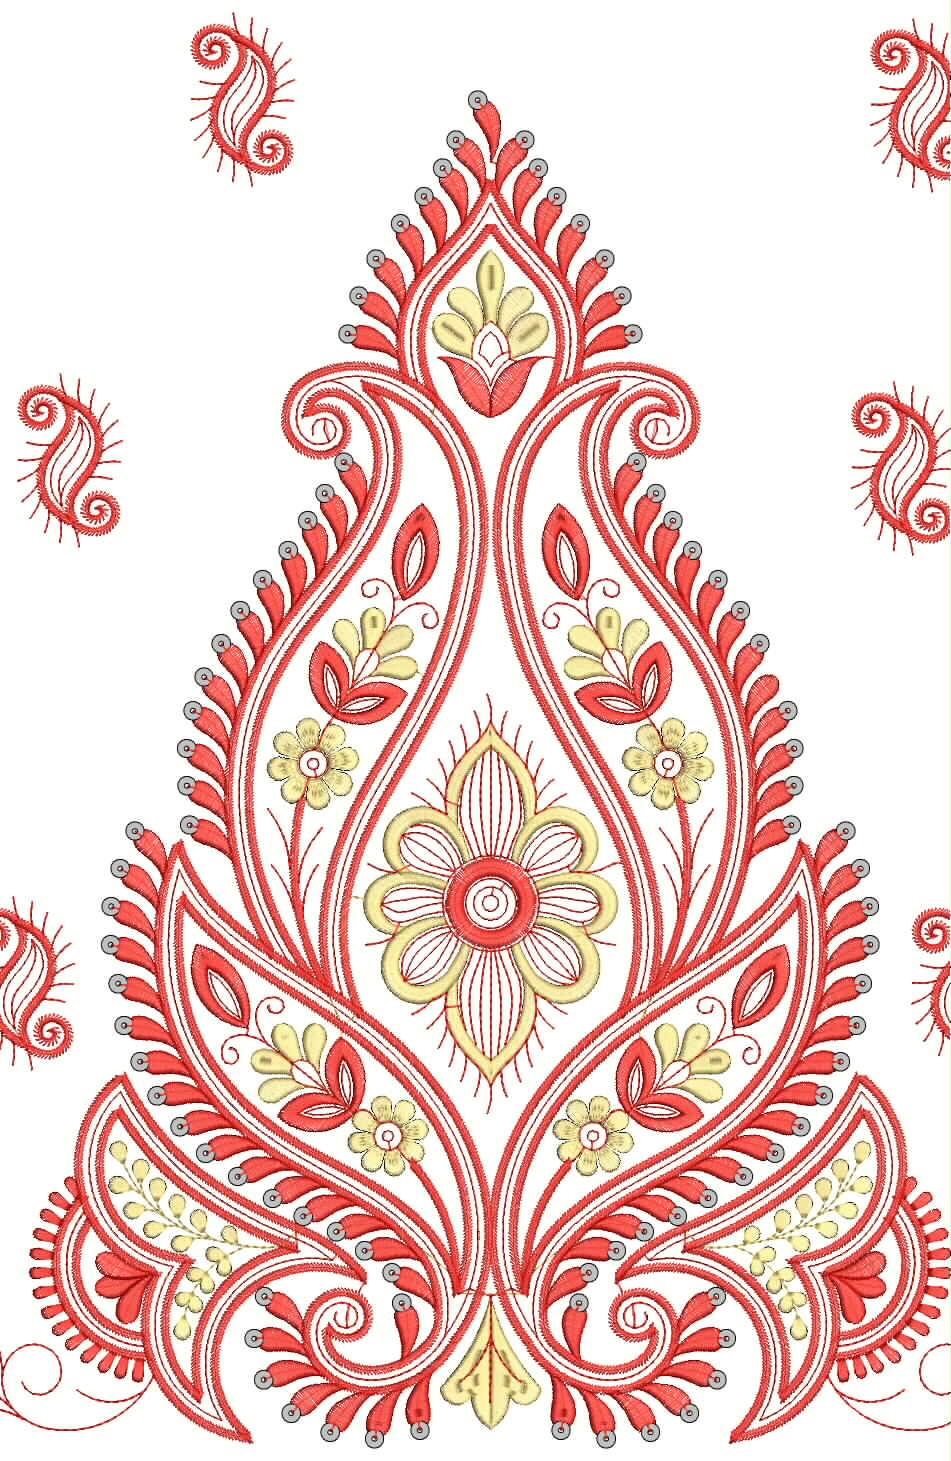 Embdesigntube Download 5 Mm Sequin Embroidery Design